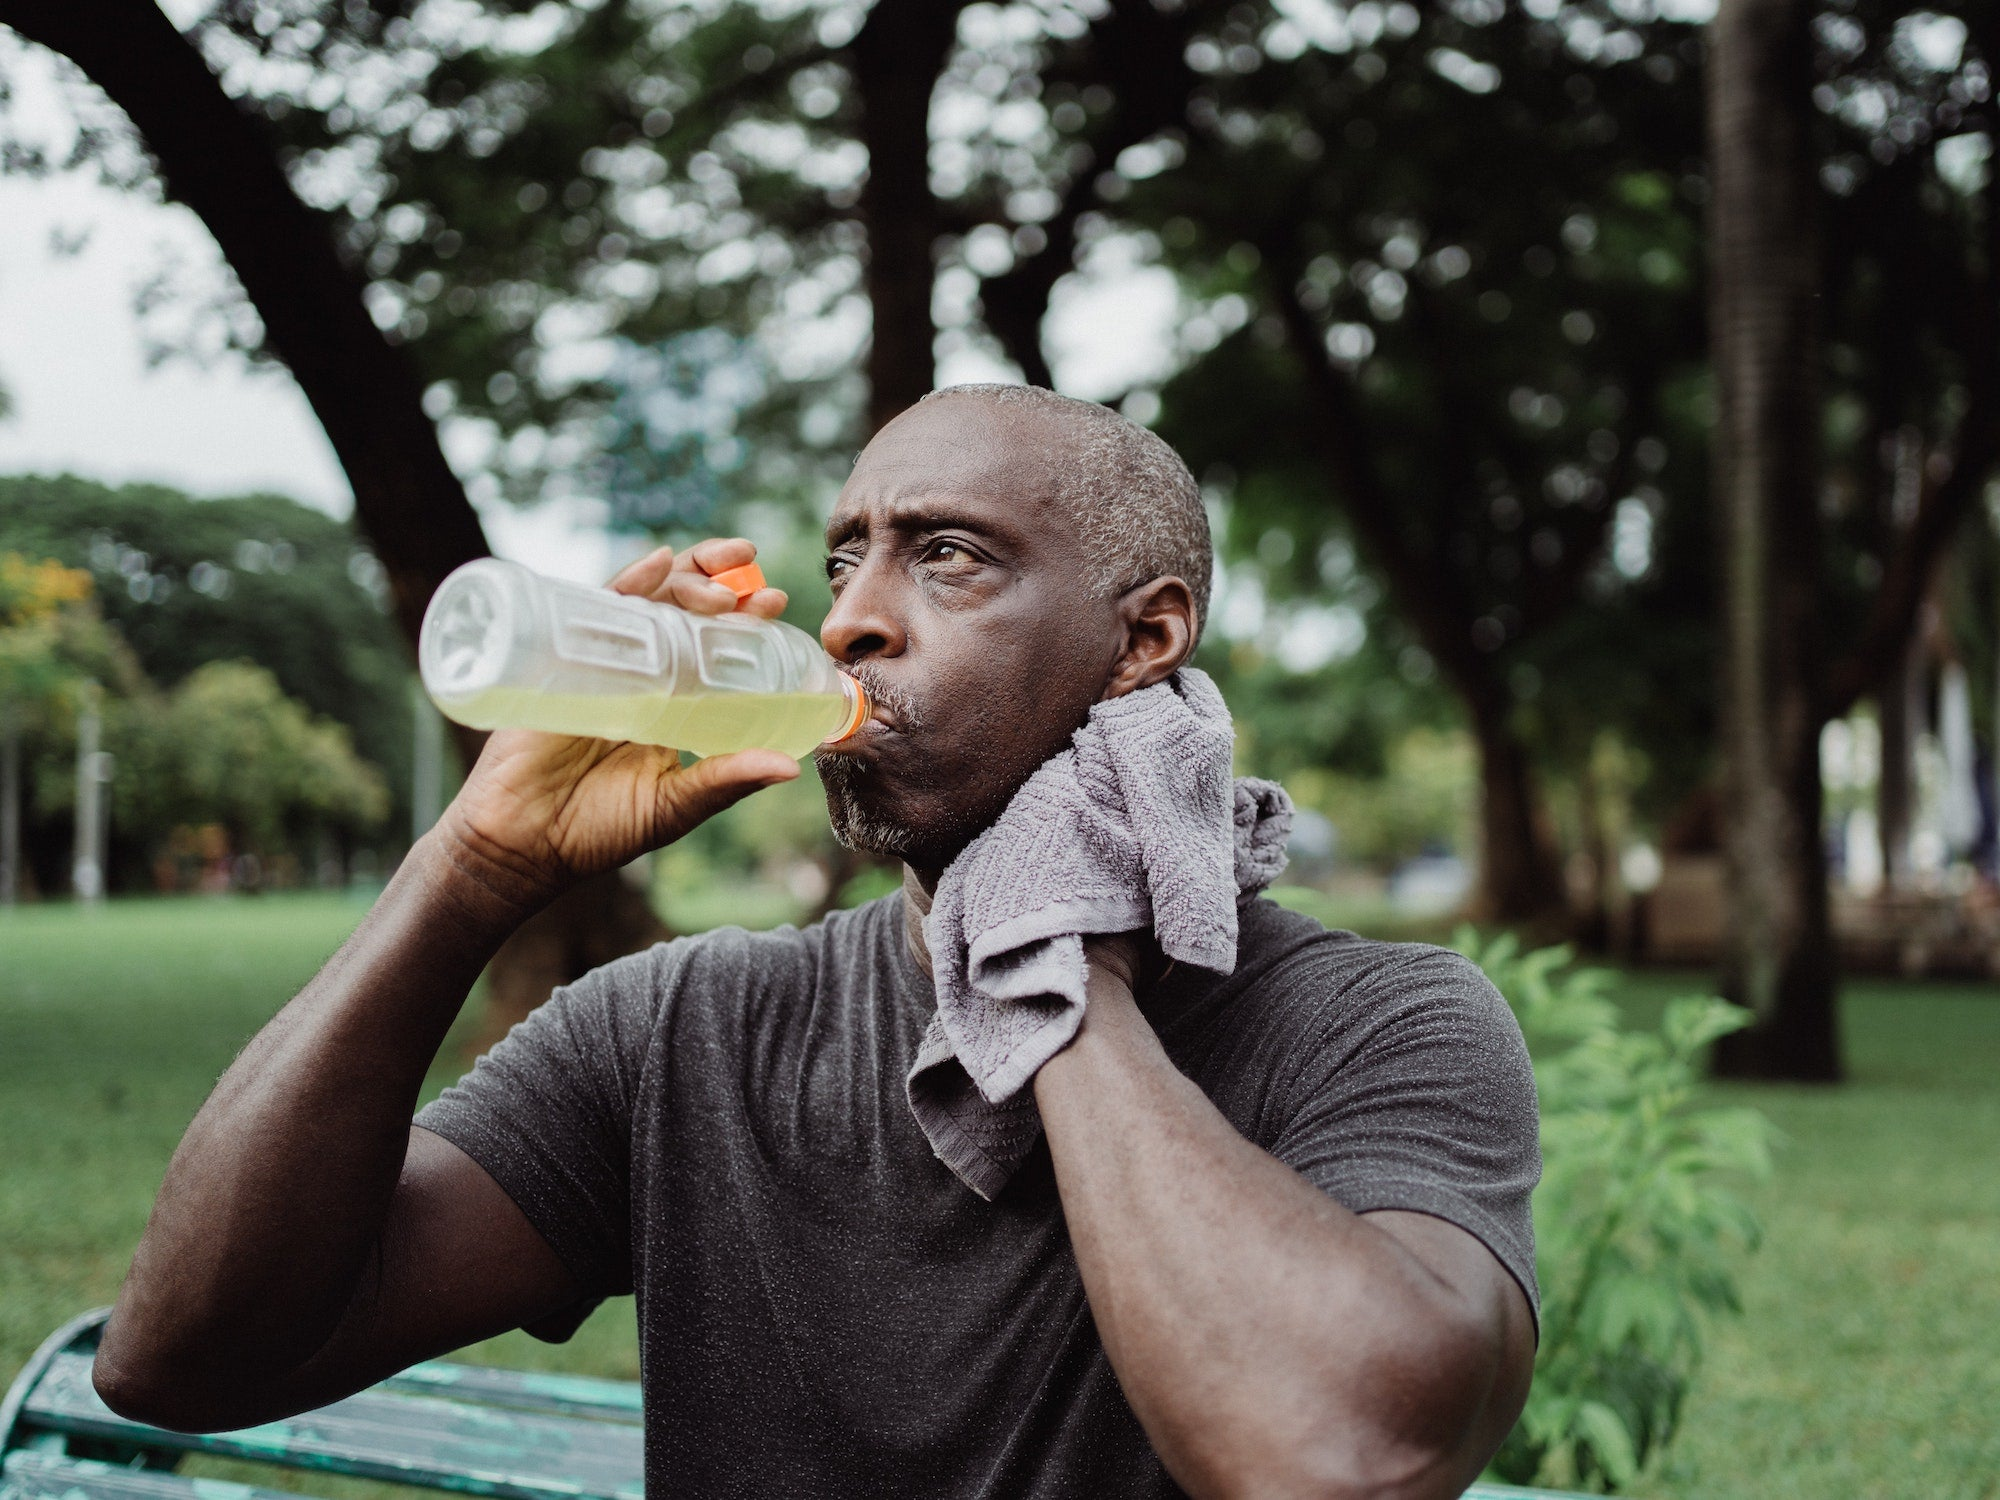 man drinking sports drink sweating sitting on bench